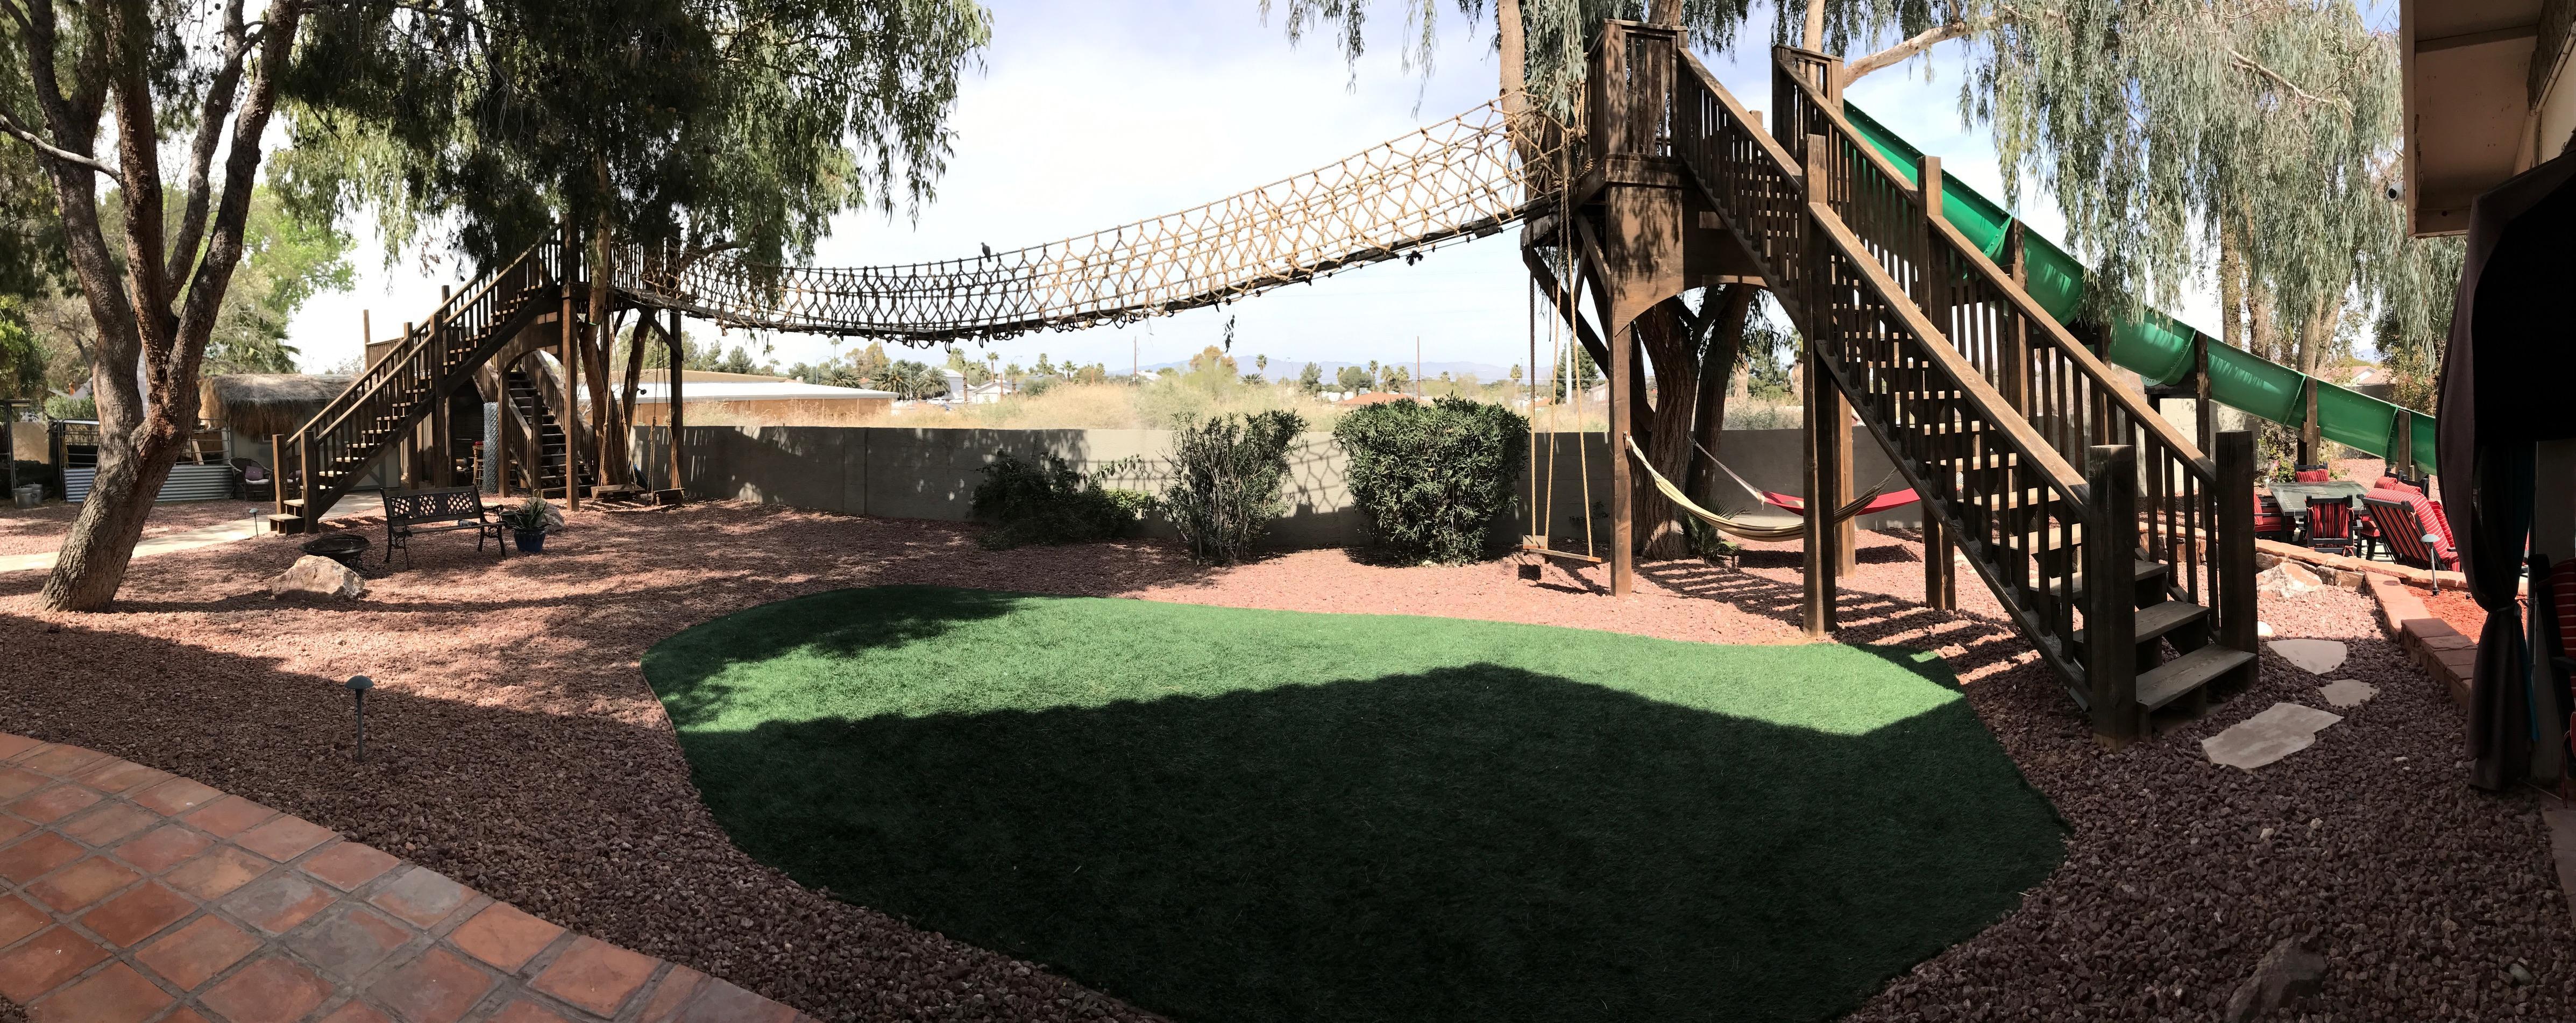 backyard picnic winner week four ksnv